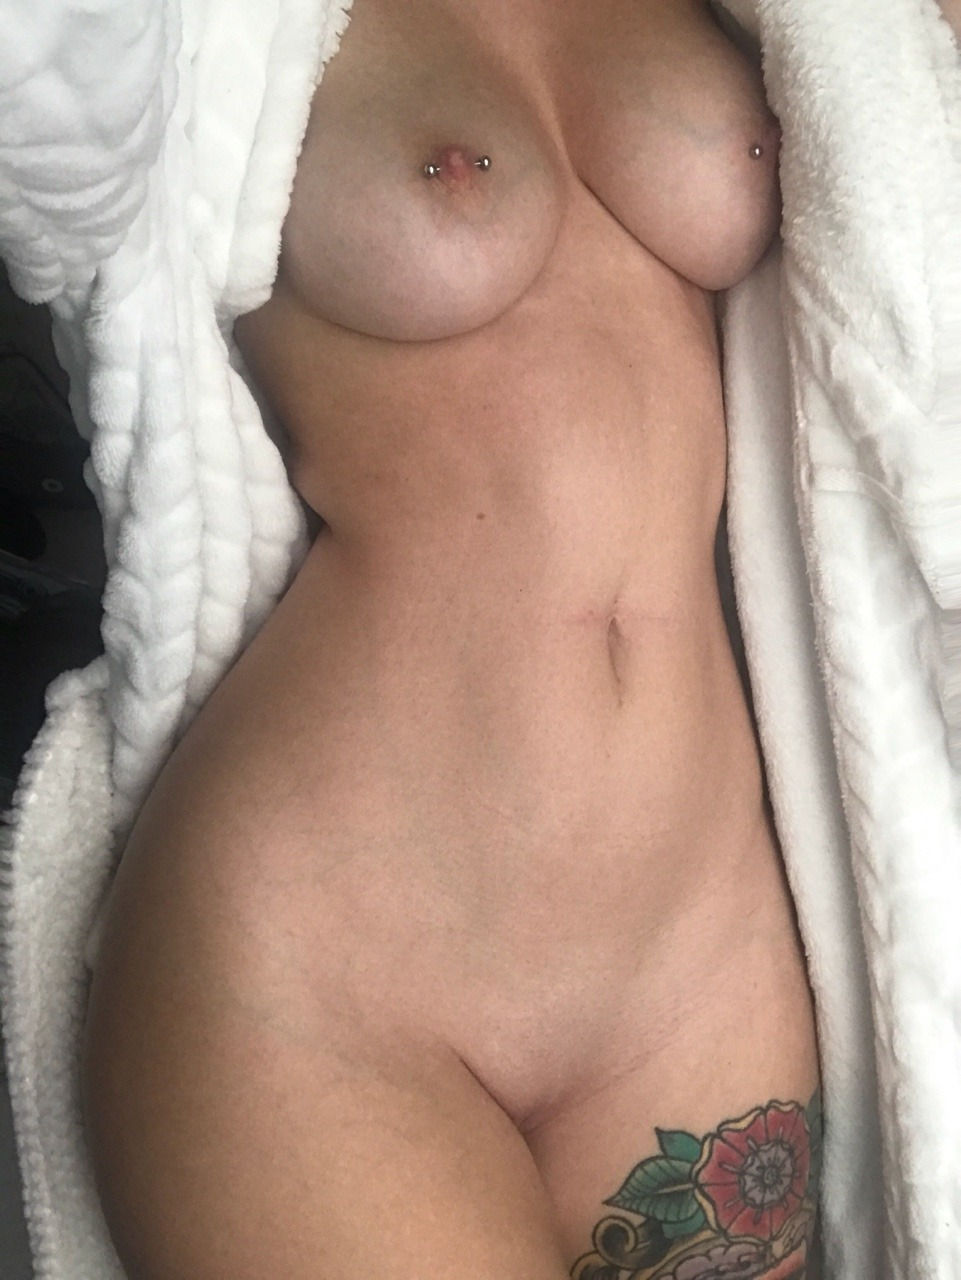 Hot body snap..